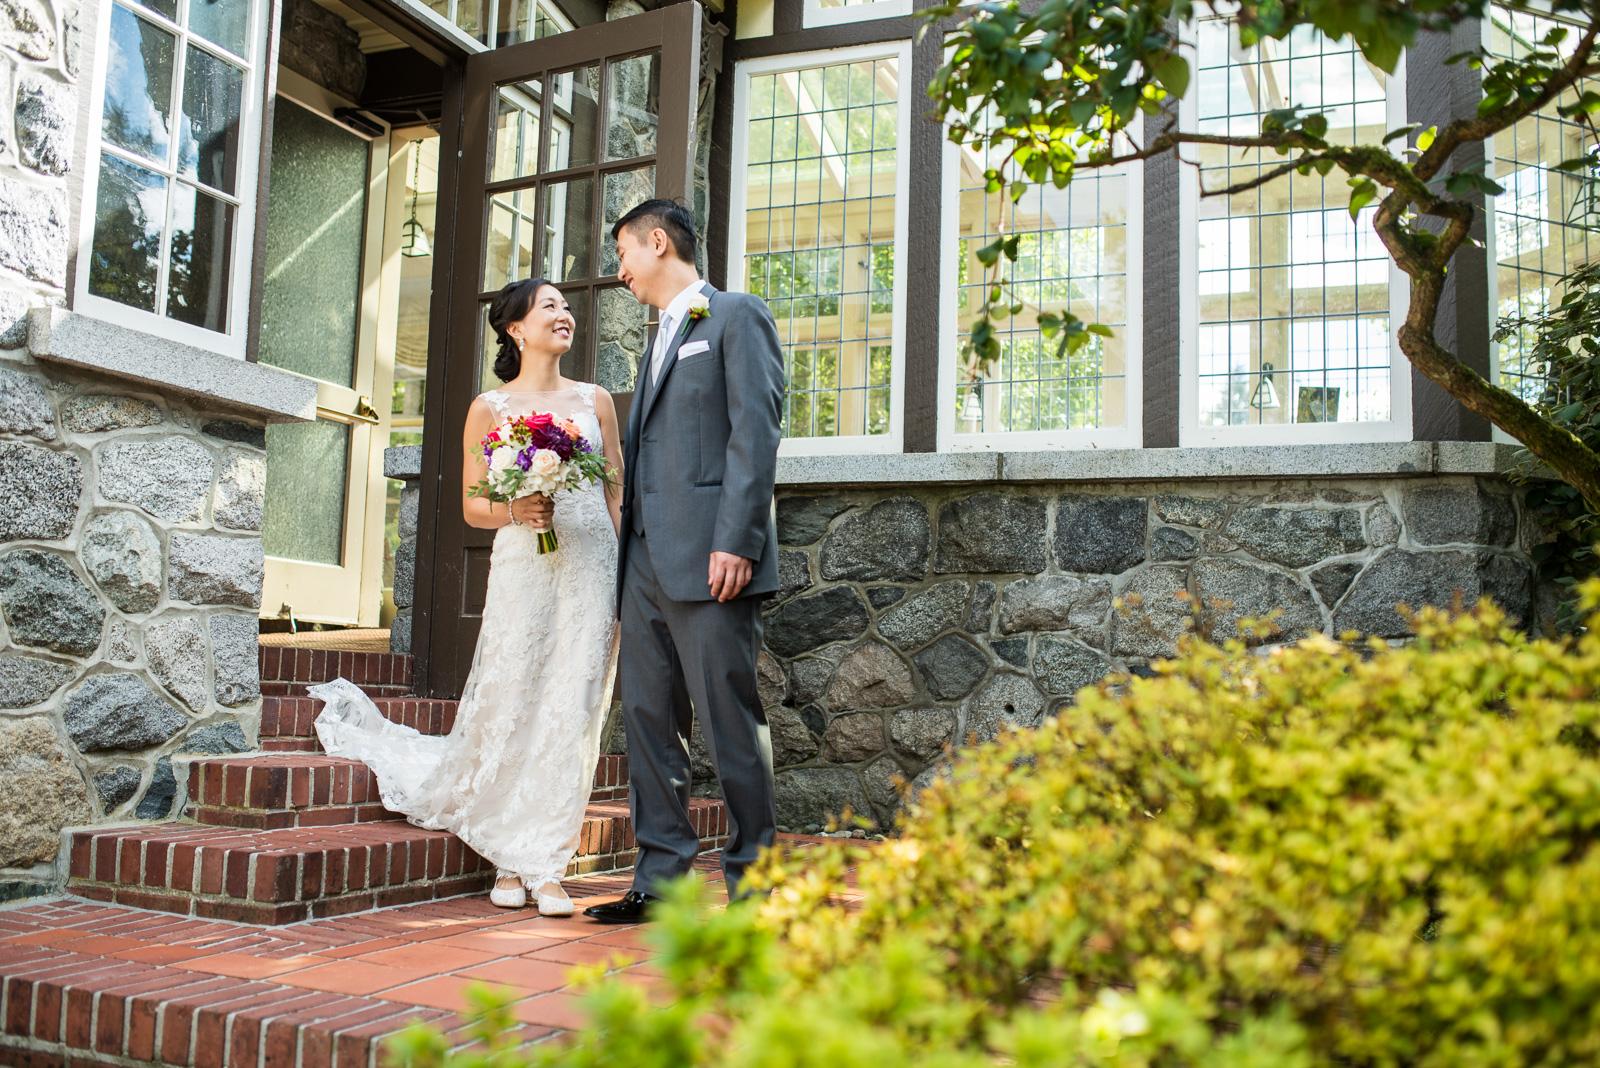 victoria-wedding-photographers-cecil-green-park-house-wedding-19.jpg